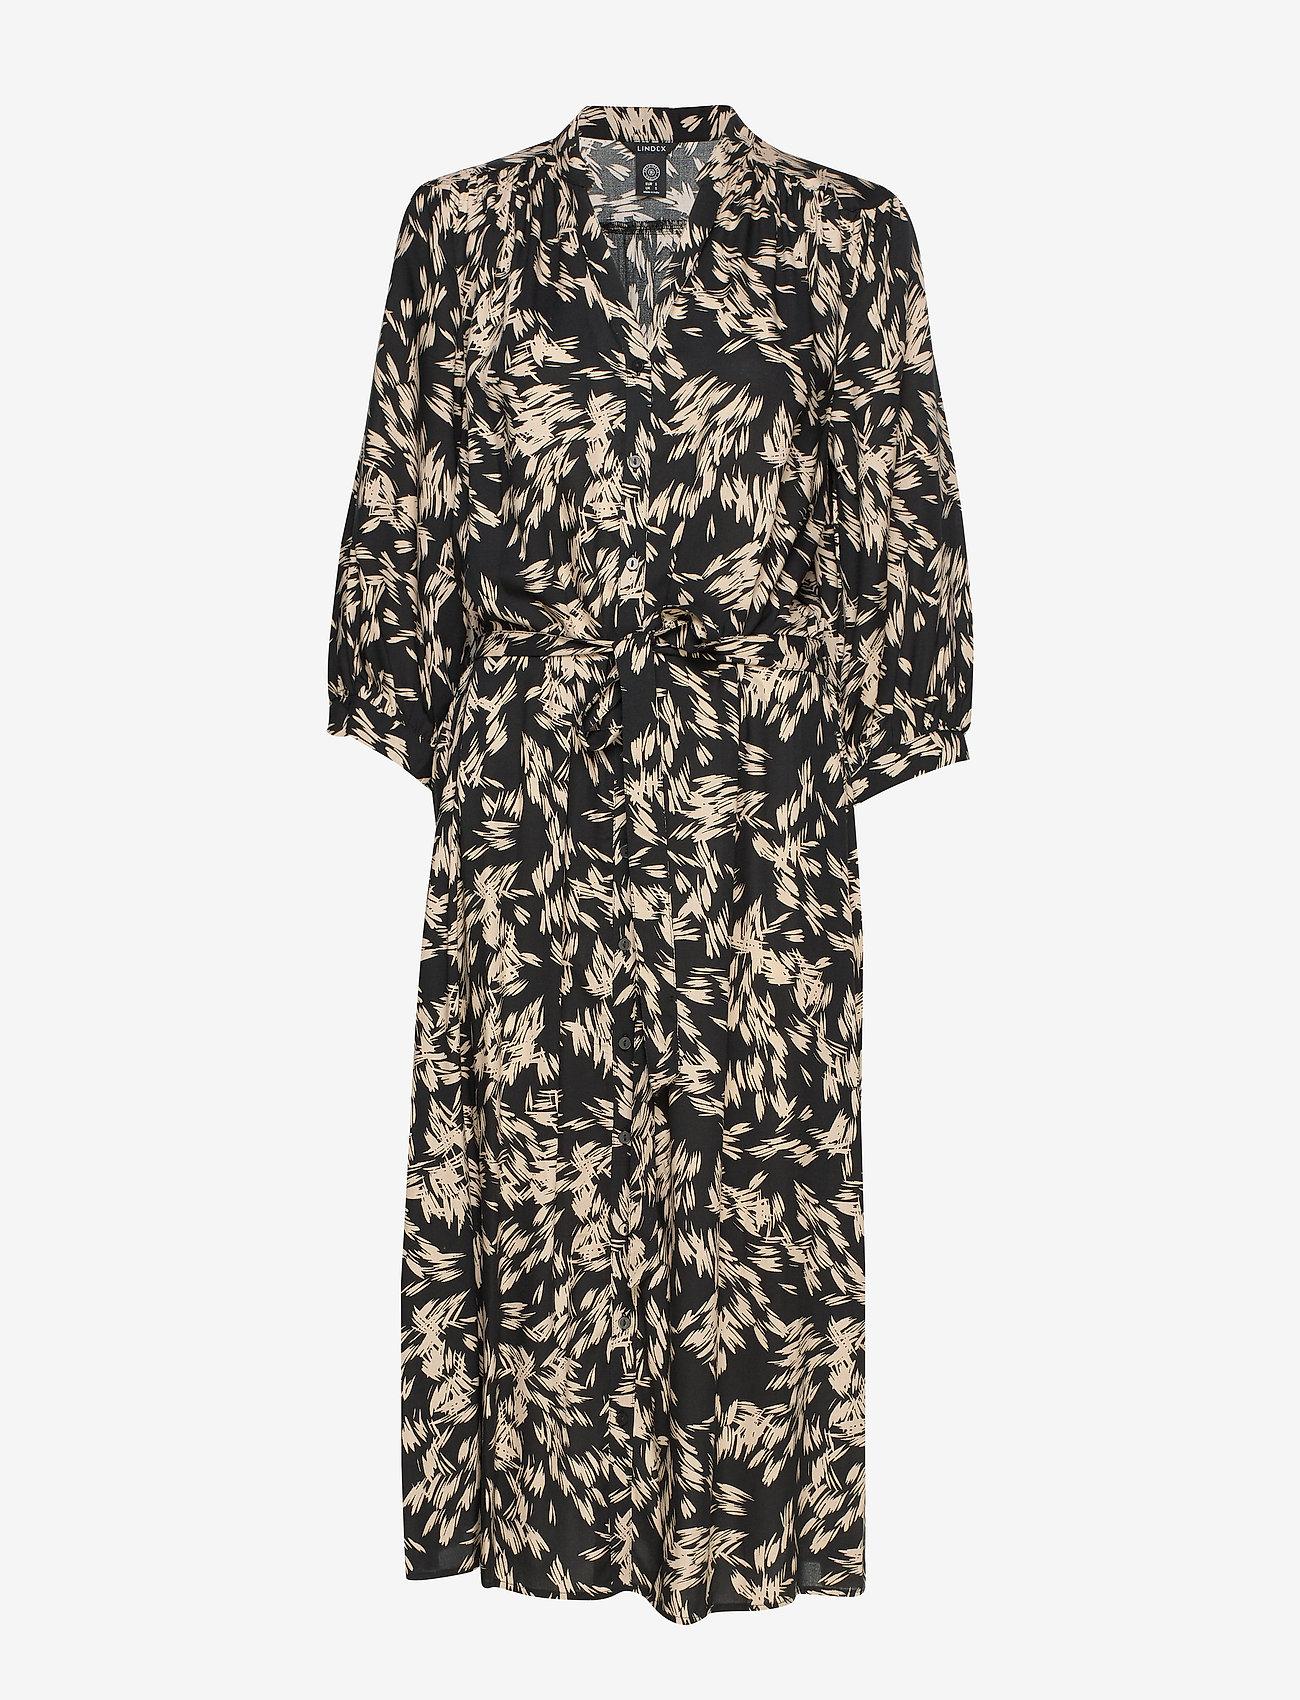 Lindex Dress Karen- Robes AVbctQAP f9osi gNJIUVkZ